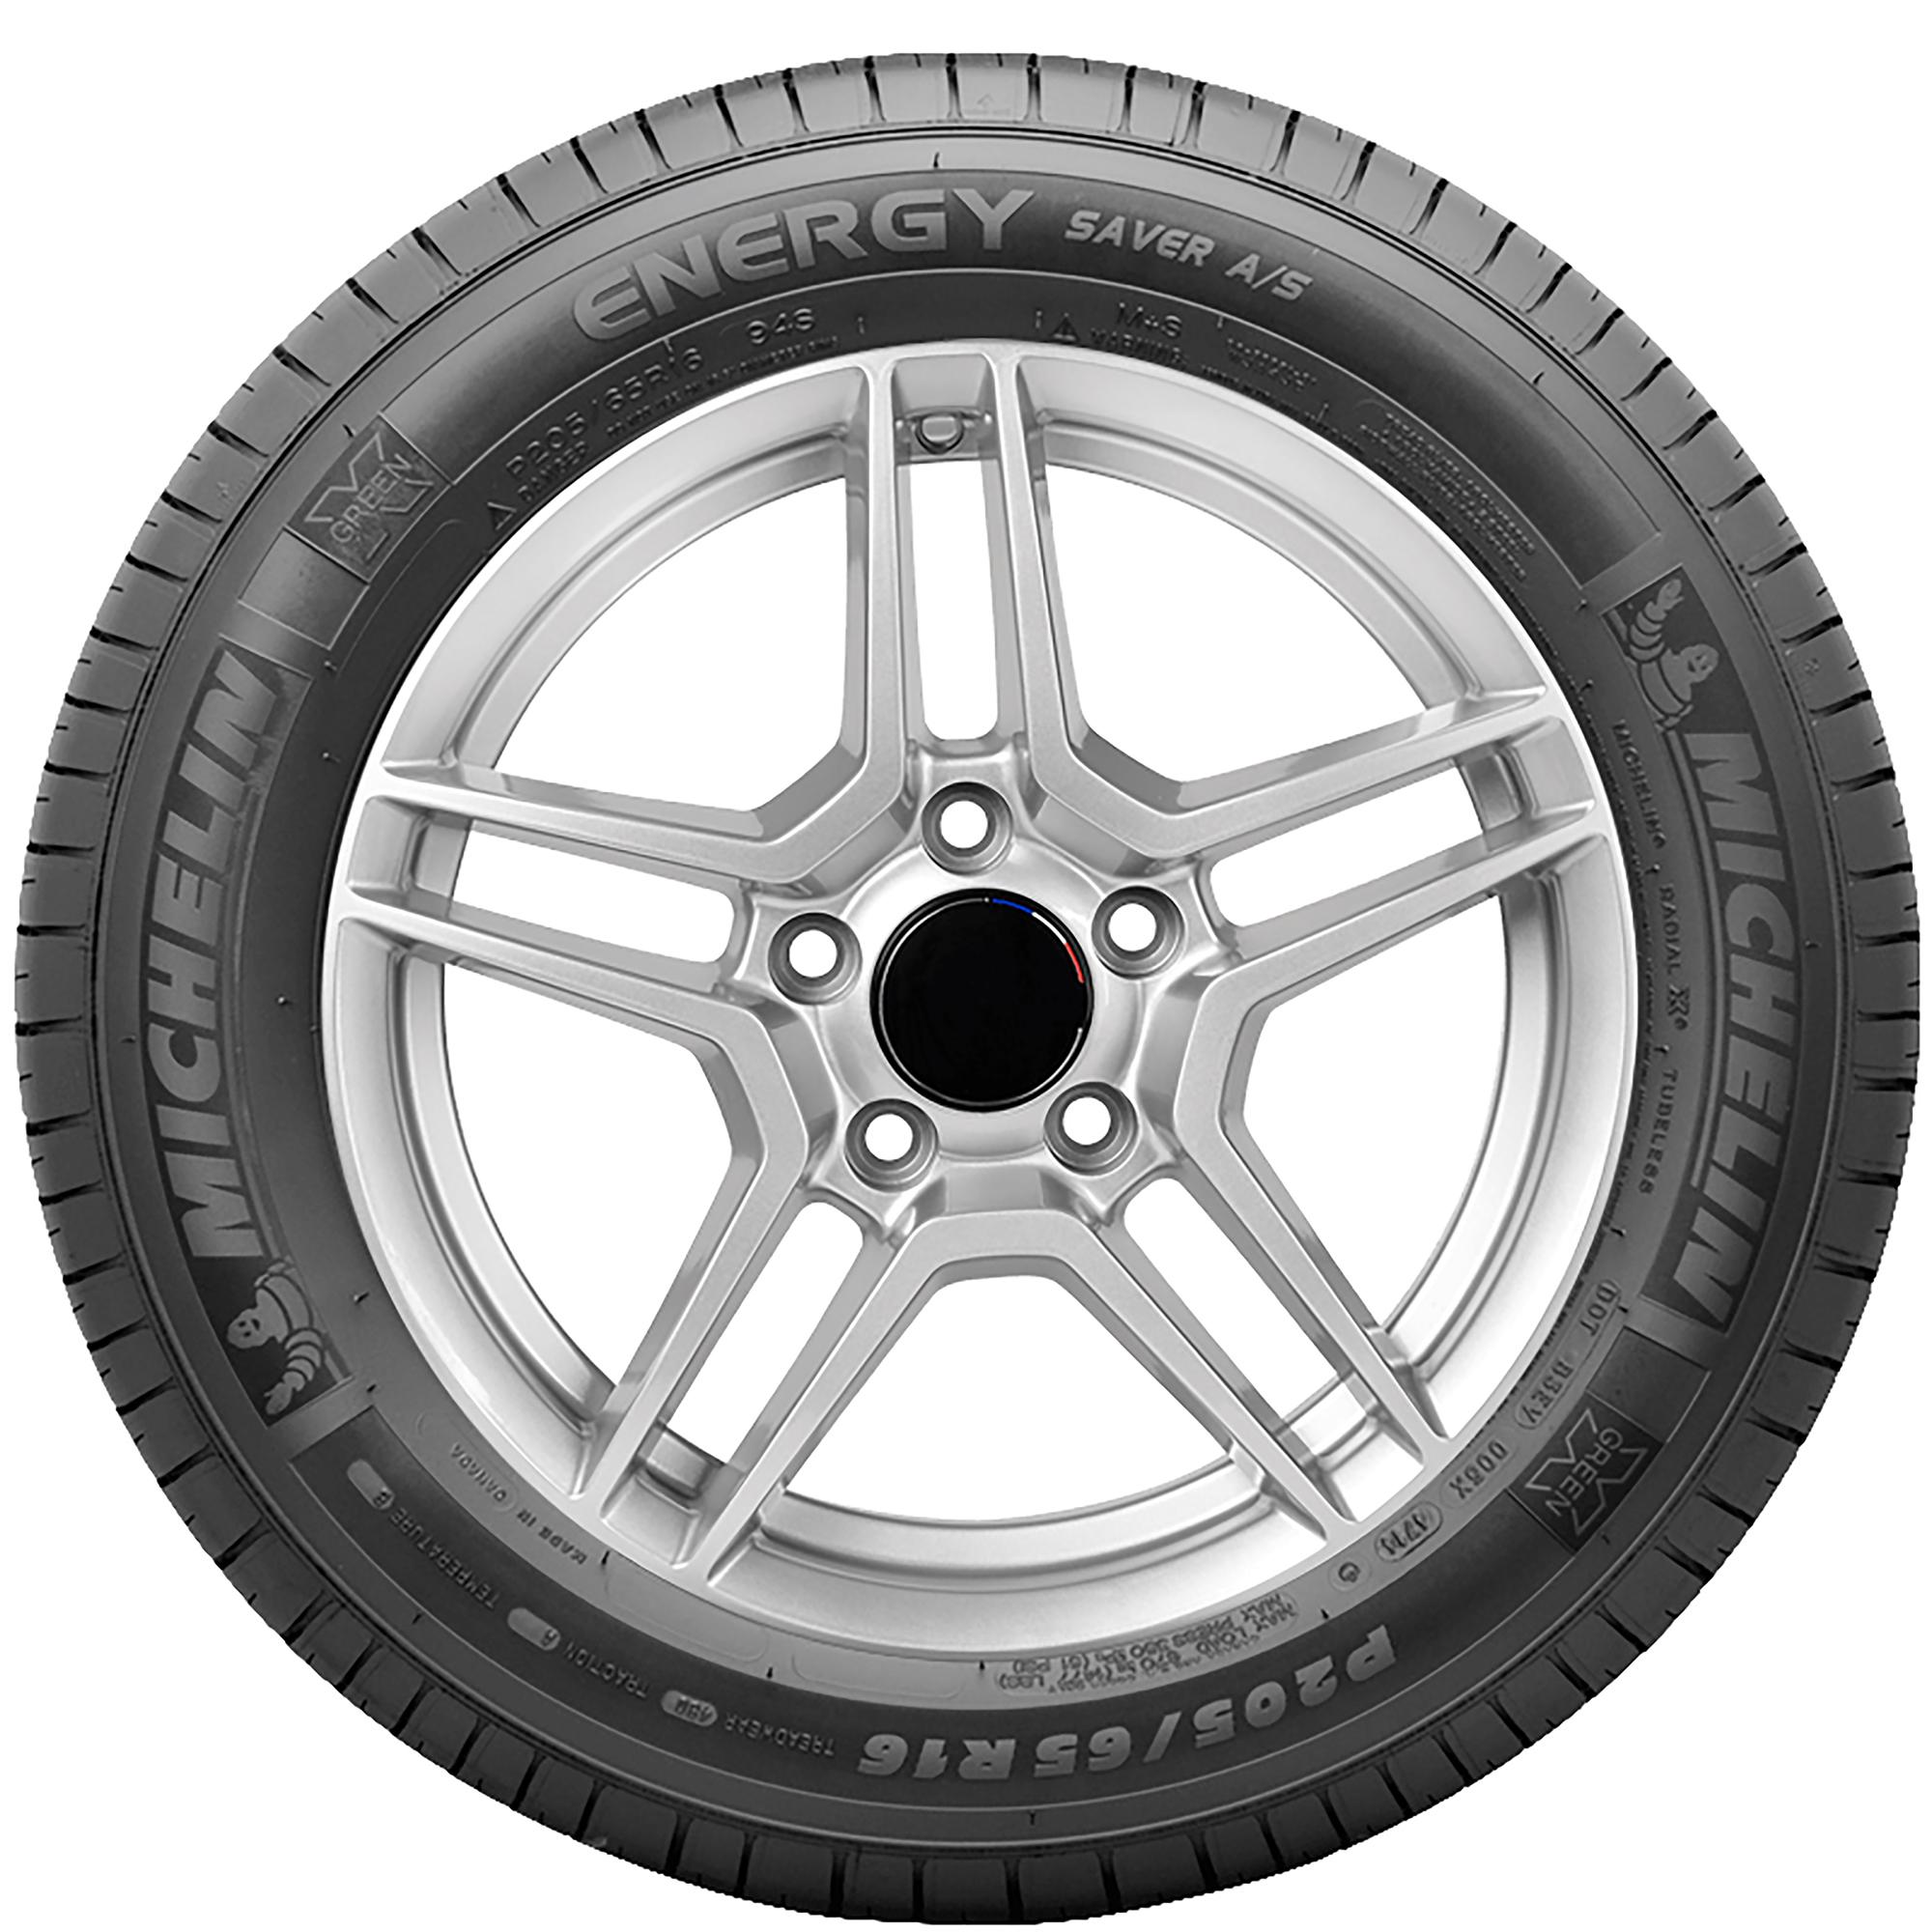 wheels  michelin energy saver all season passenger tire p205 65r16 94s